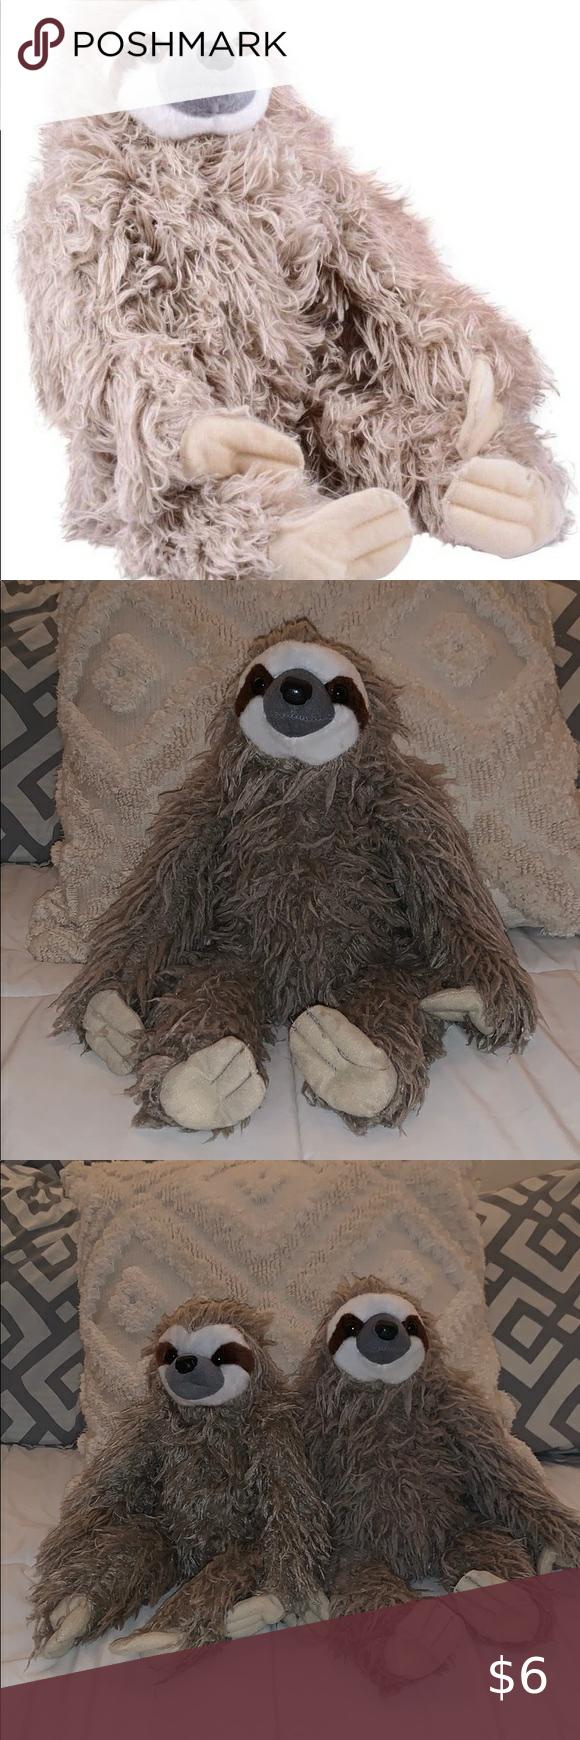 Sloth Stuffed Animal in 2020 Sloth stuffed animal, Sloth